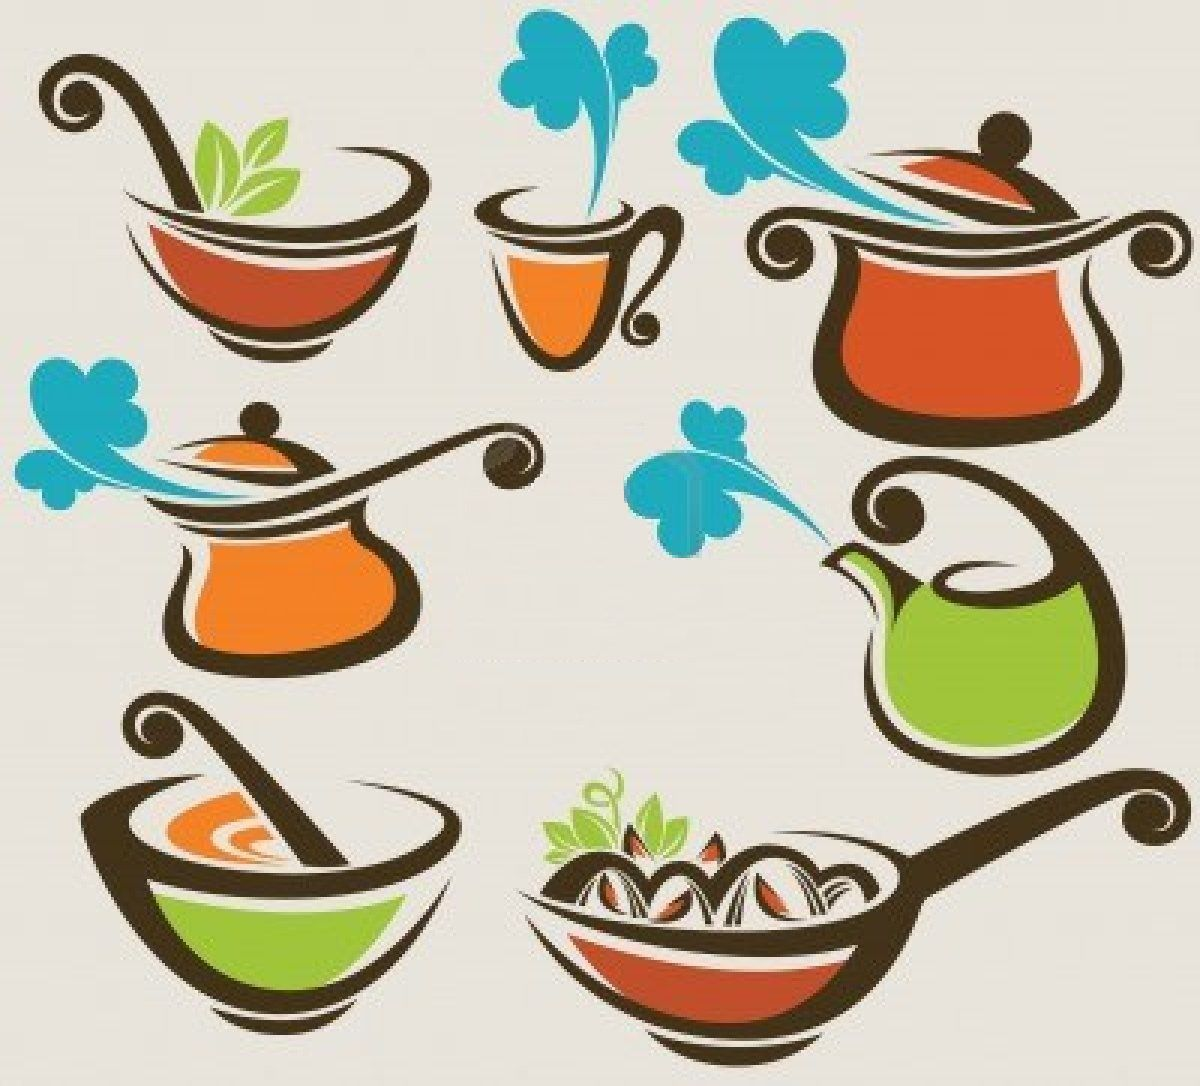 Utensilios de cocina dibujos buscar con google dulces - Utensilios de cocina de diseno ...